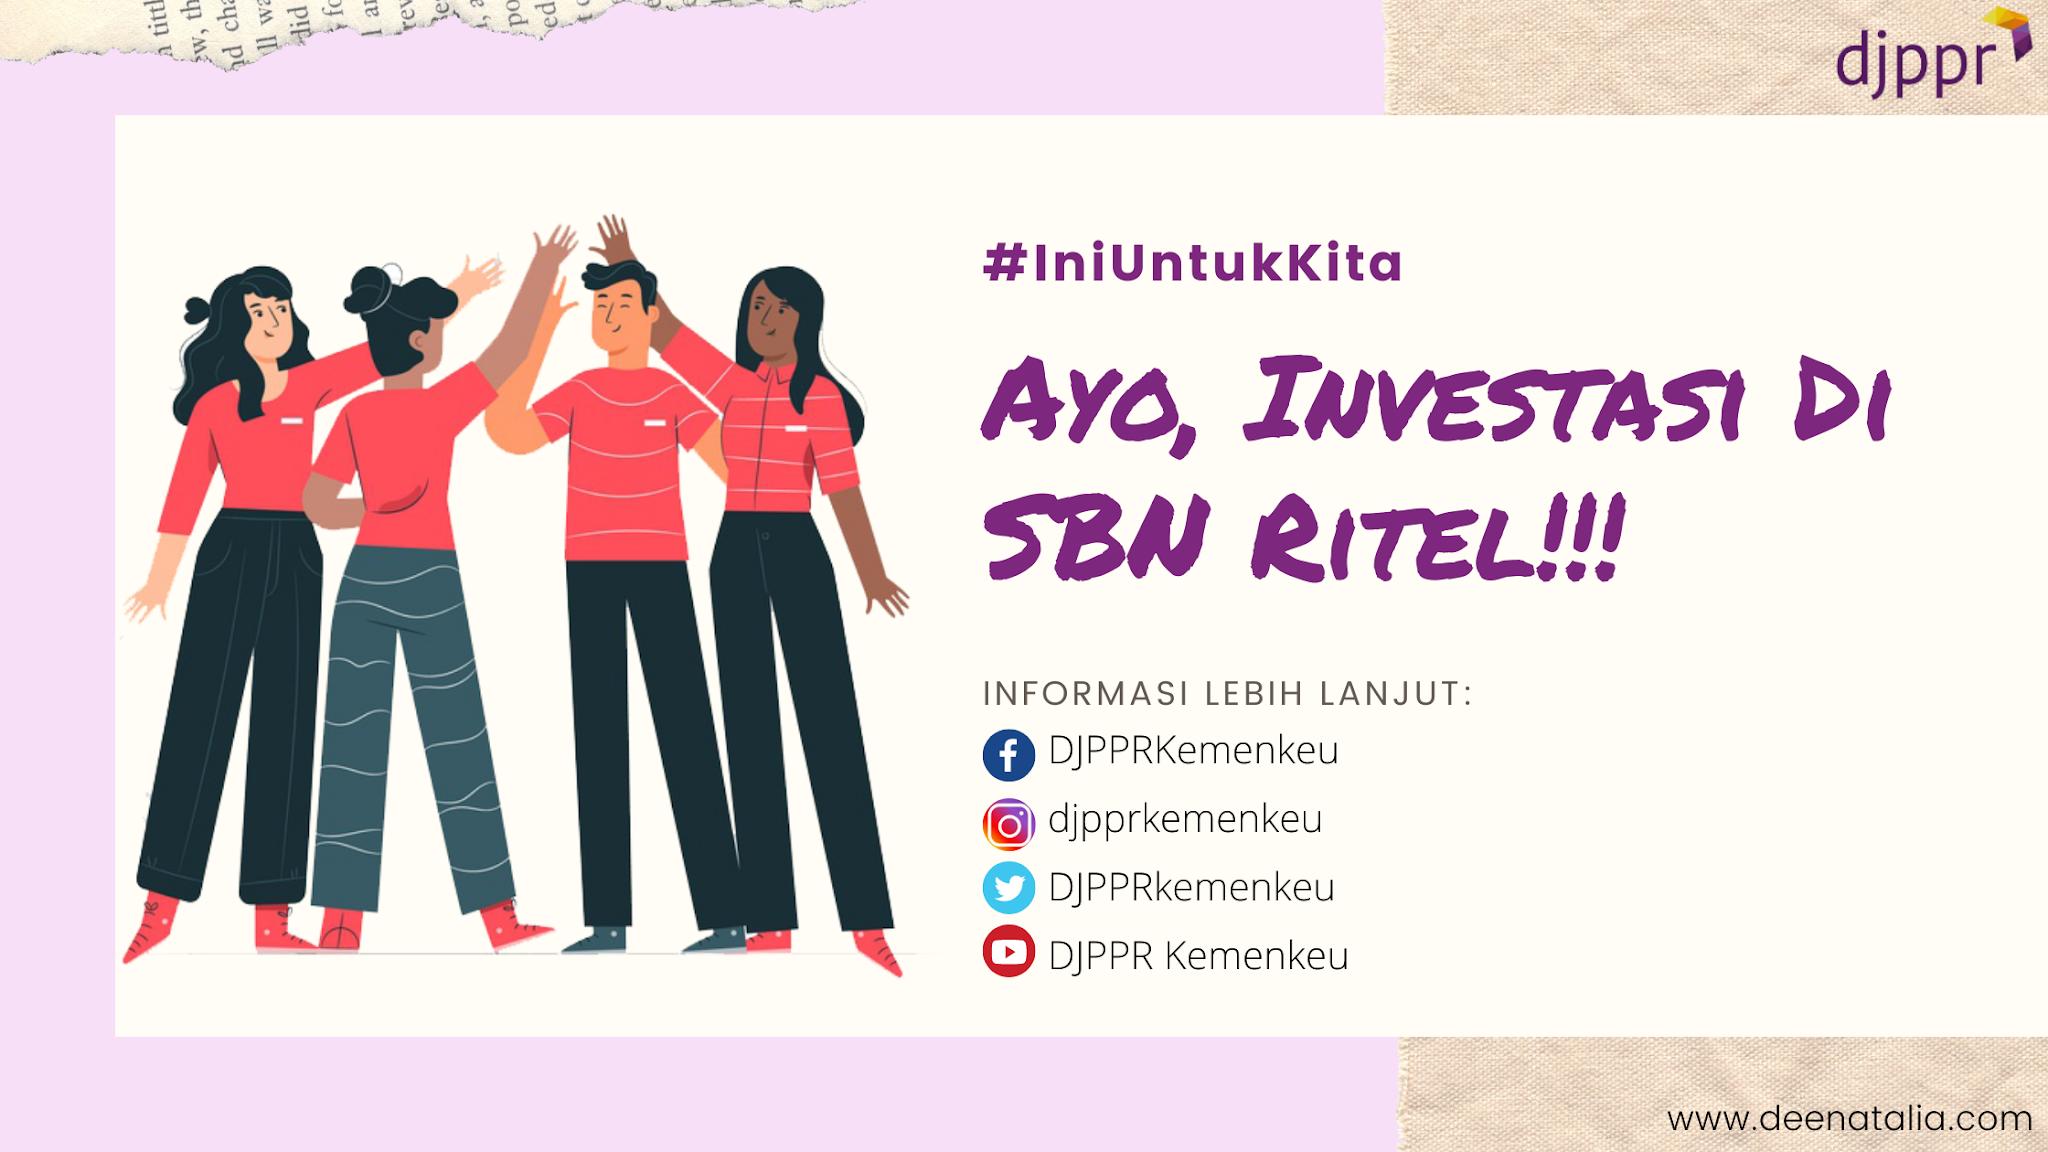 Investasi SBN Ritel #IniUntukKita